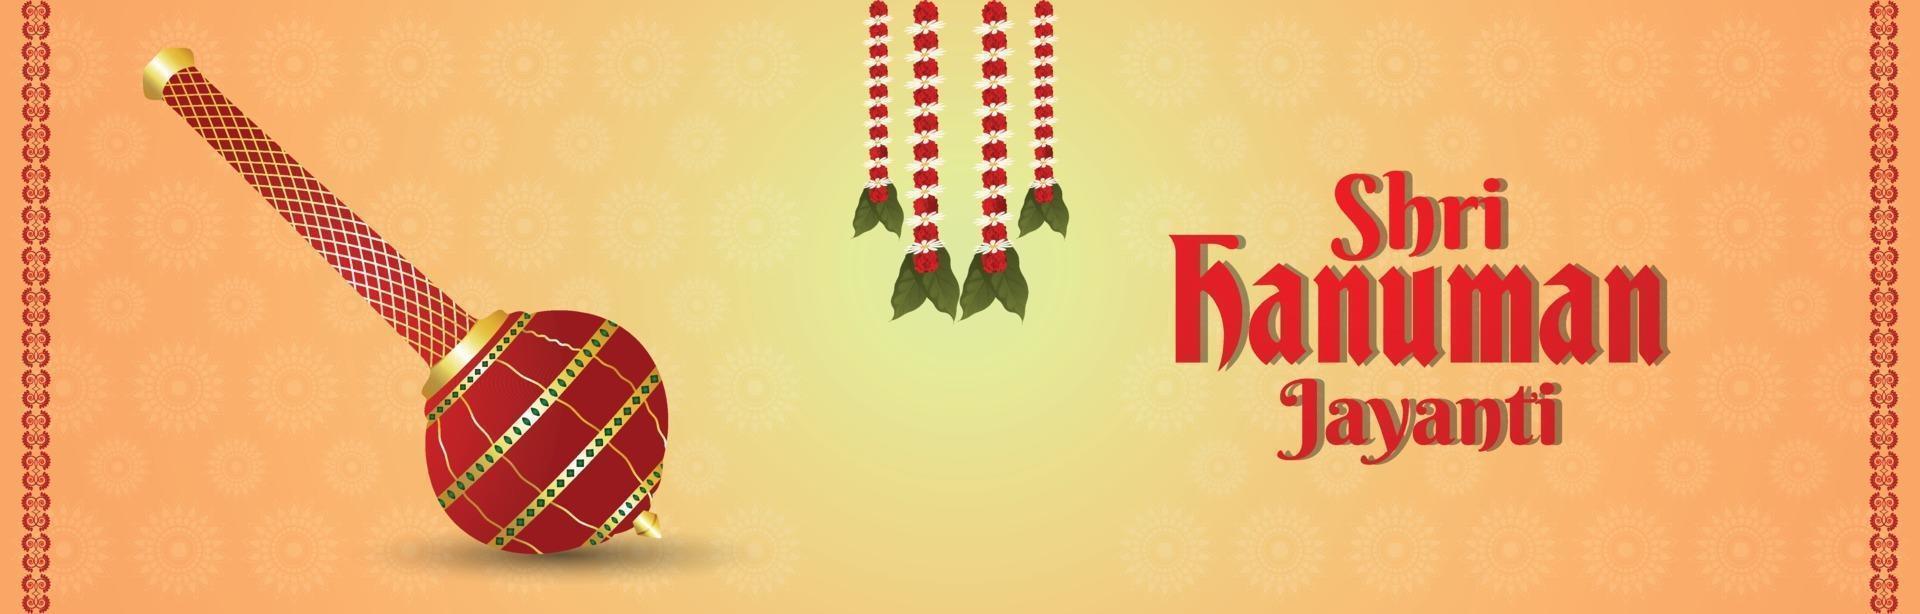 hanuman jayanti-banner eller rubrik vektor